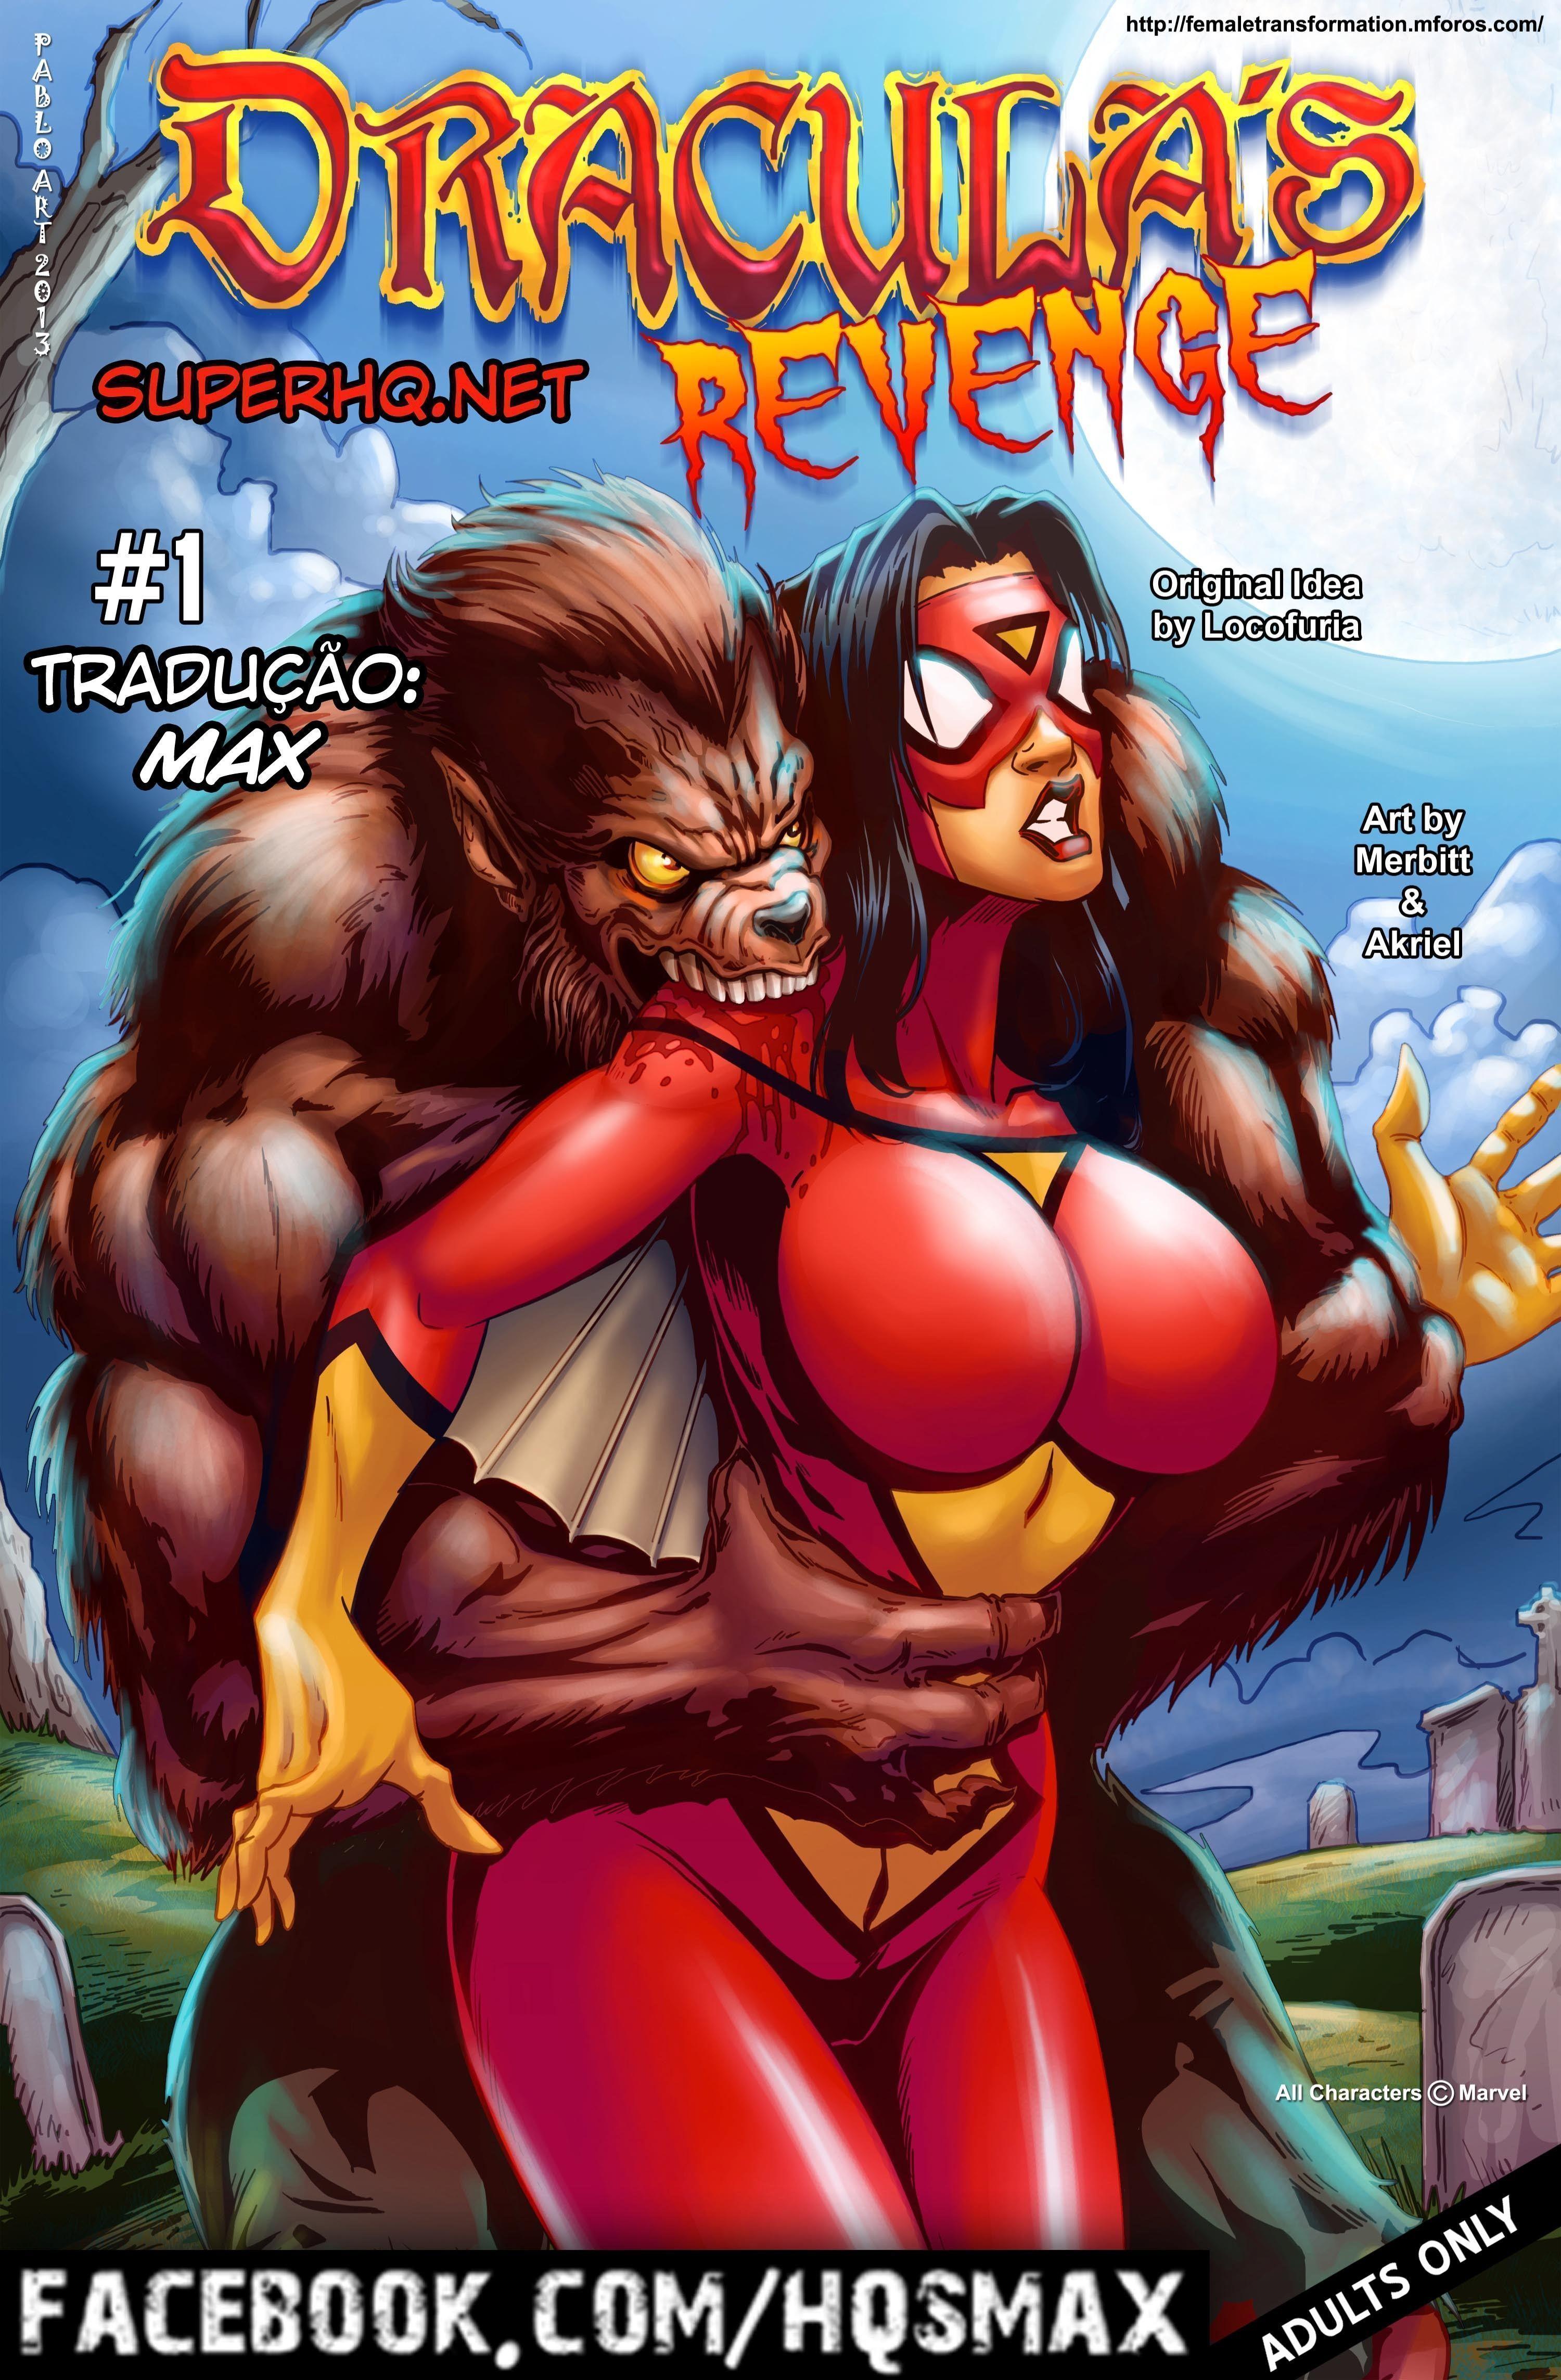 Justice league porn superhero manga luscious